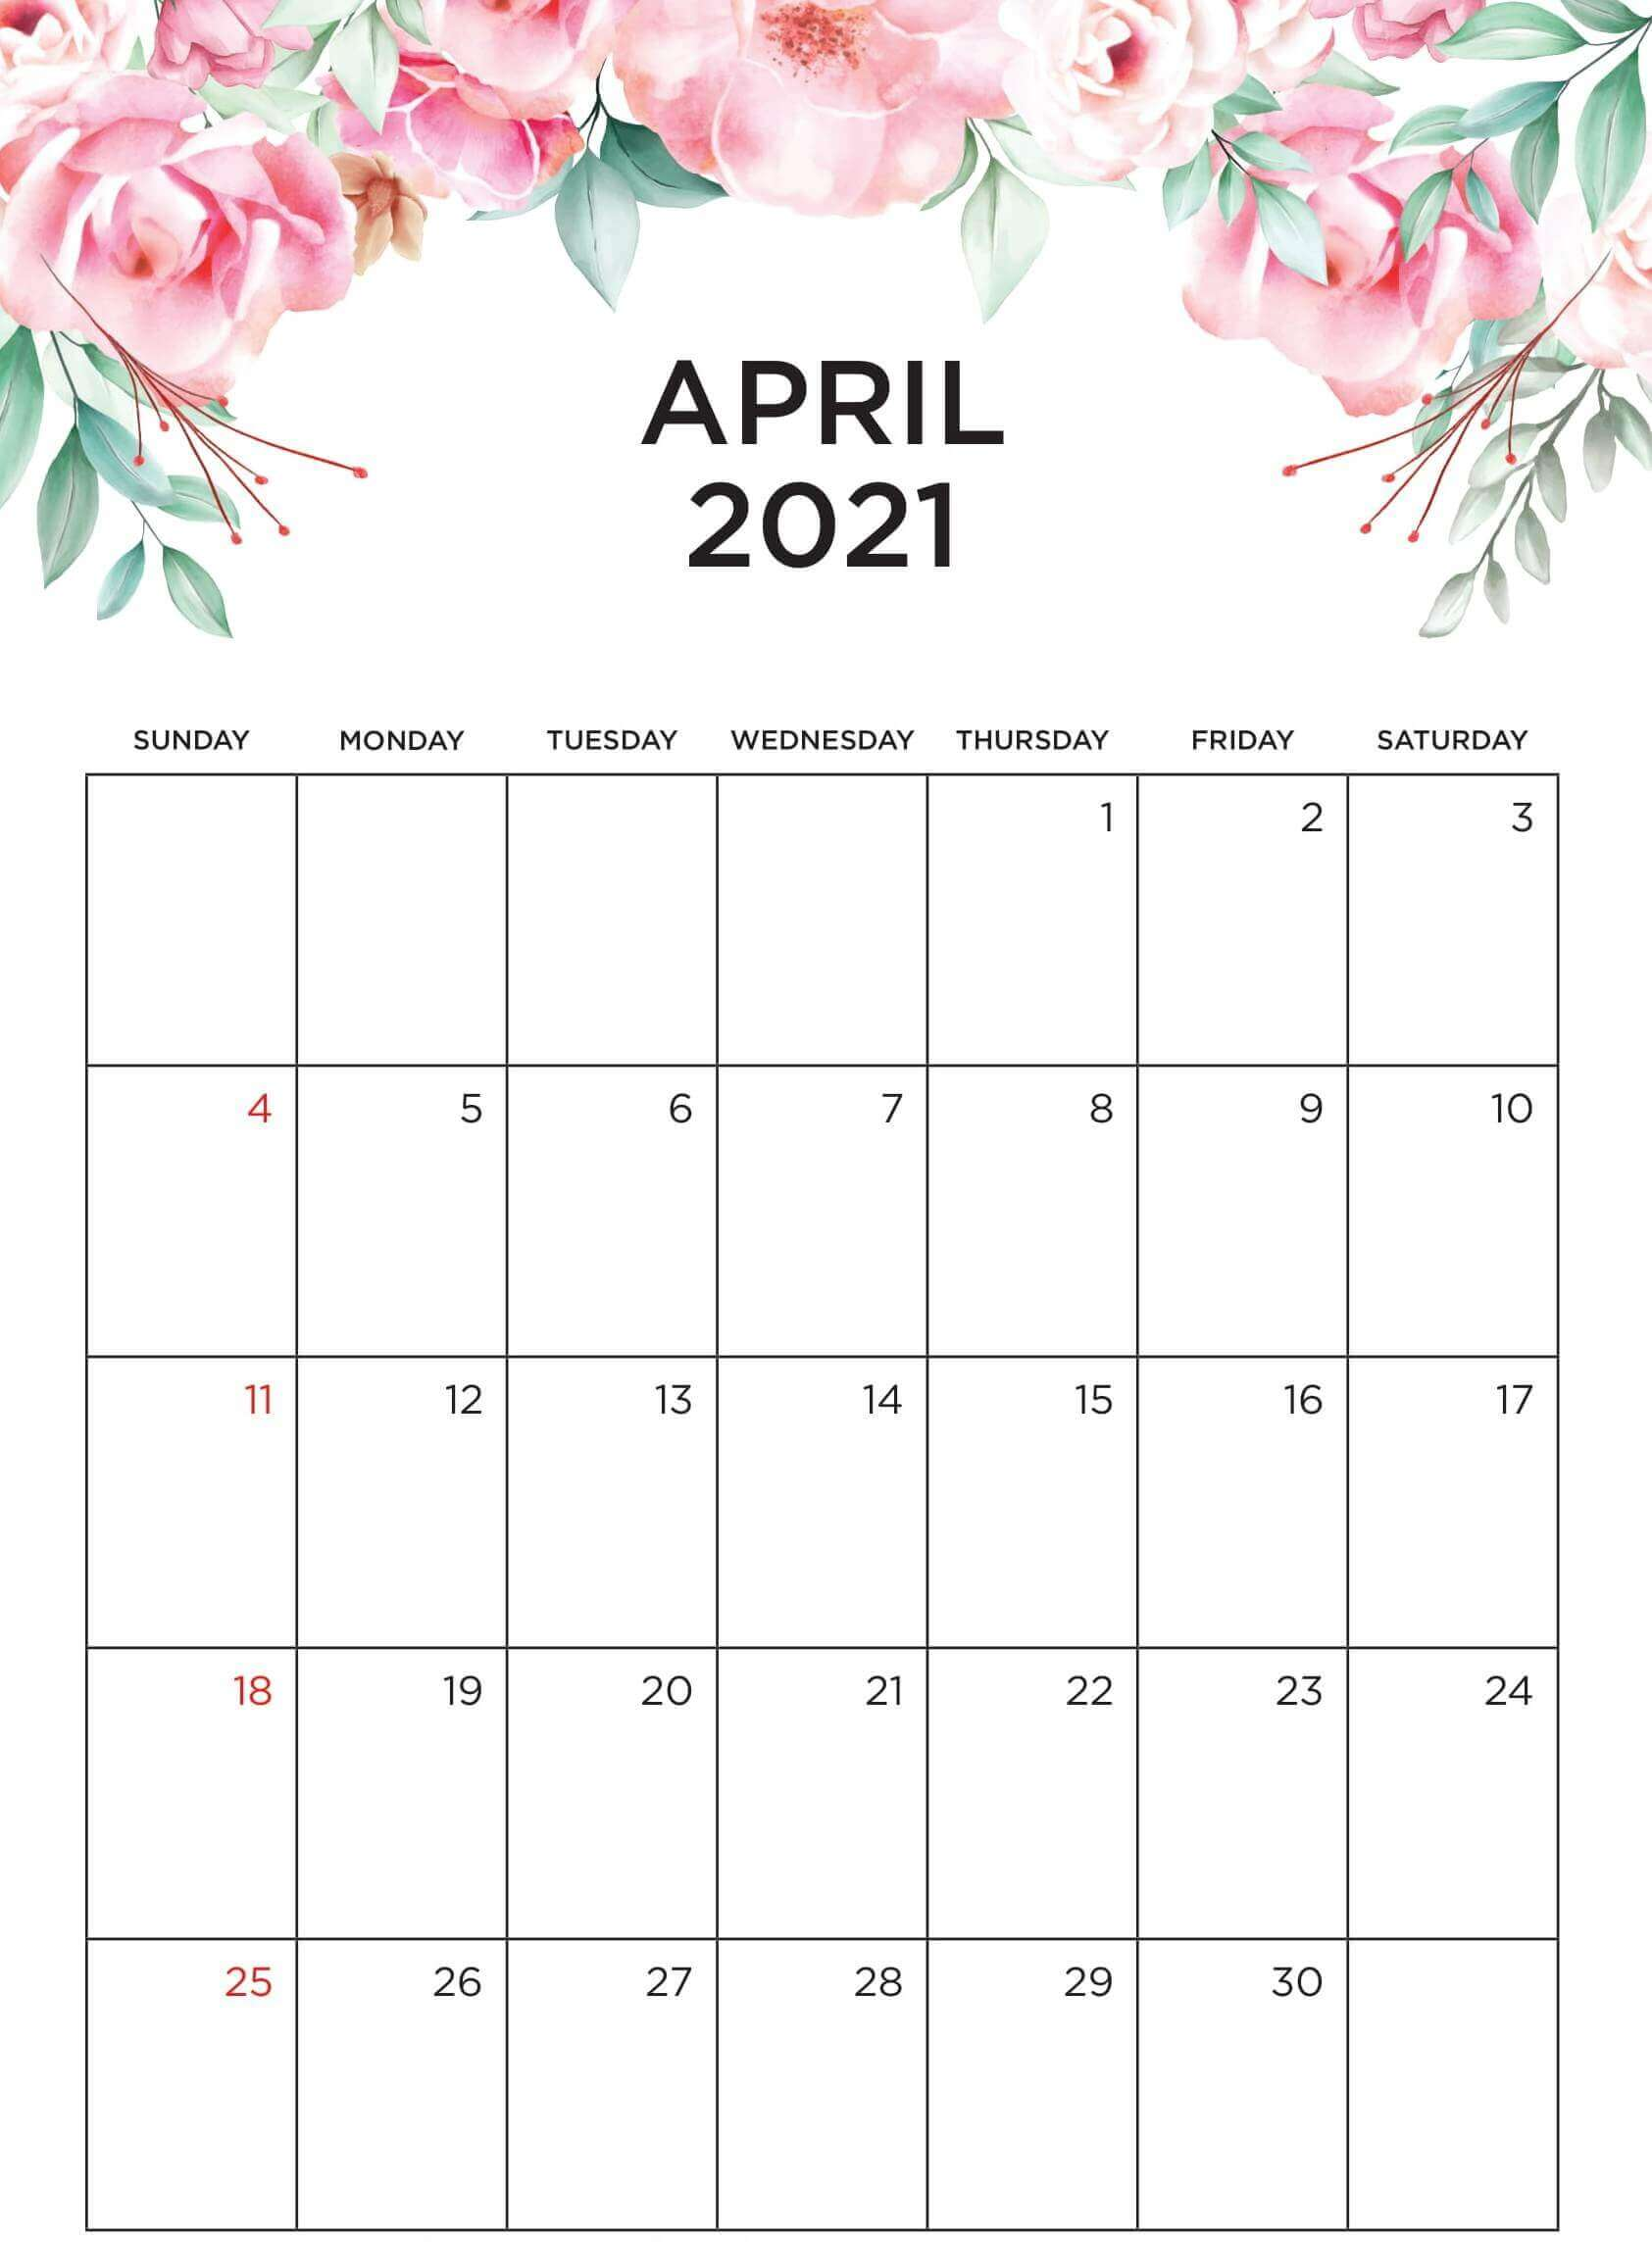 Floral April 2021 Calendar Template